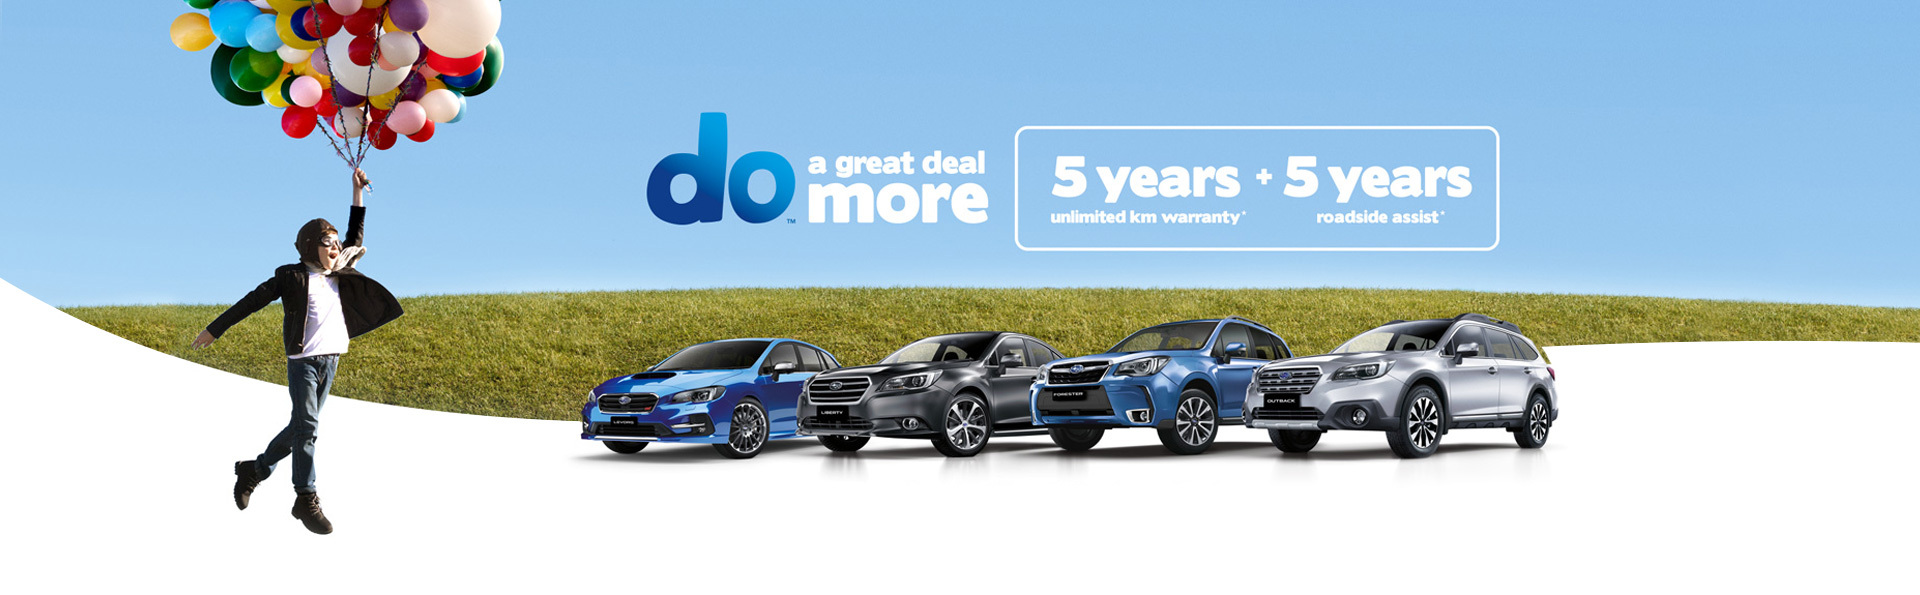 Subaru - National Offer - 5 Years Unlimited KM Warranty + 5 Years Roadside Assis